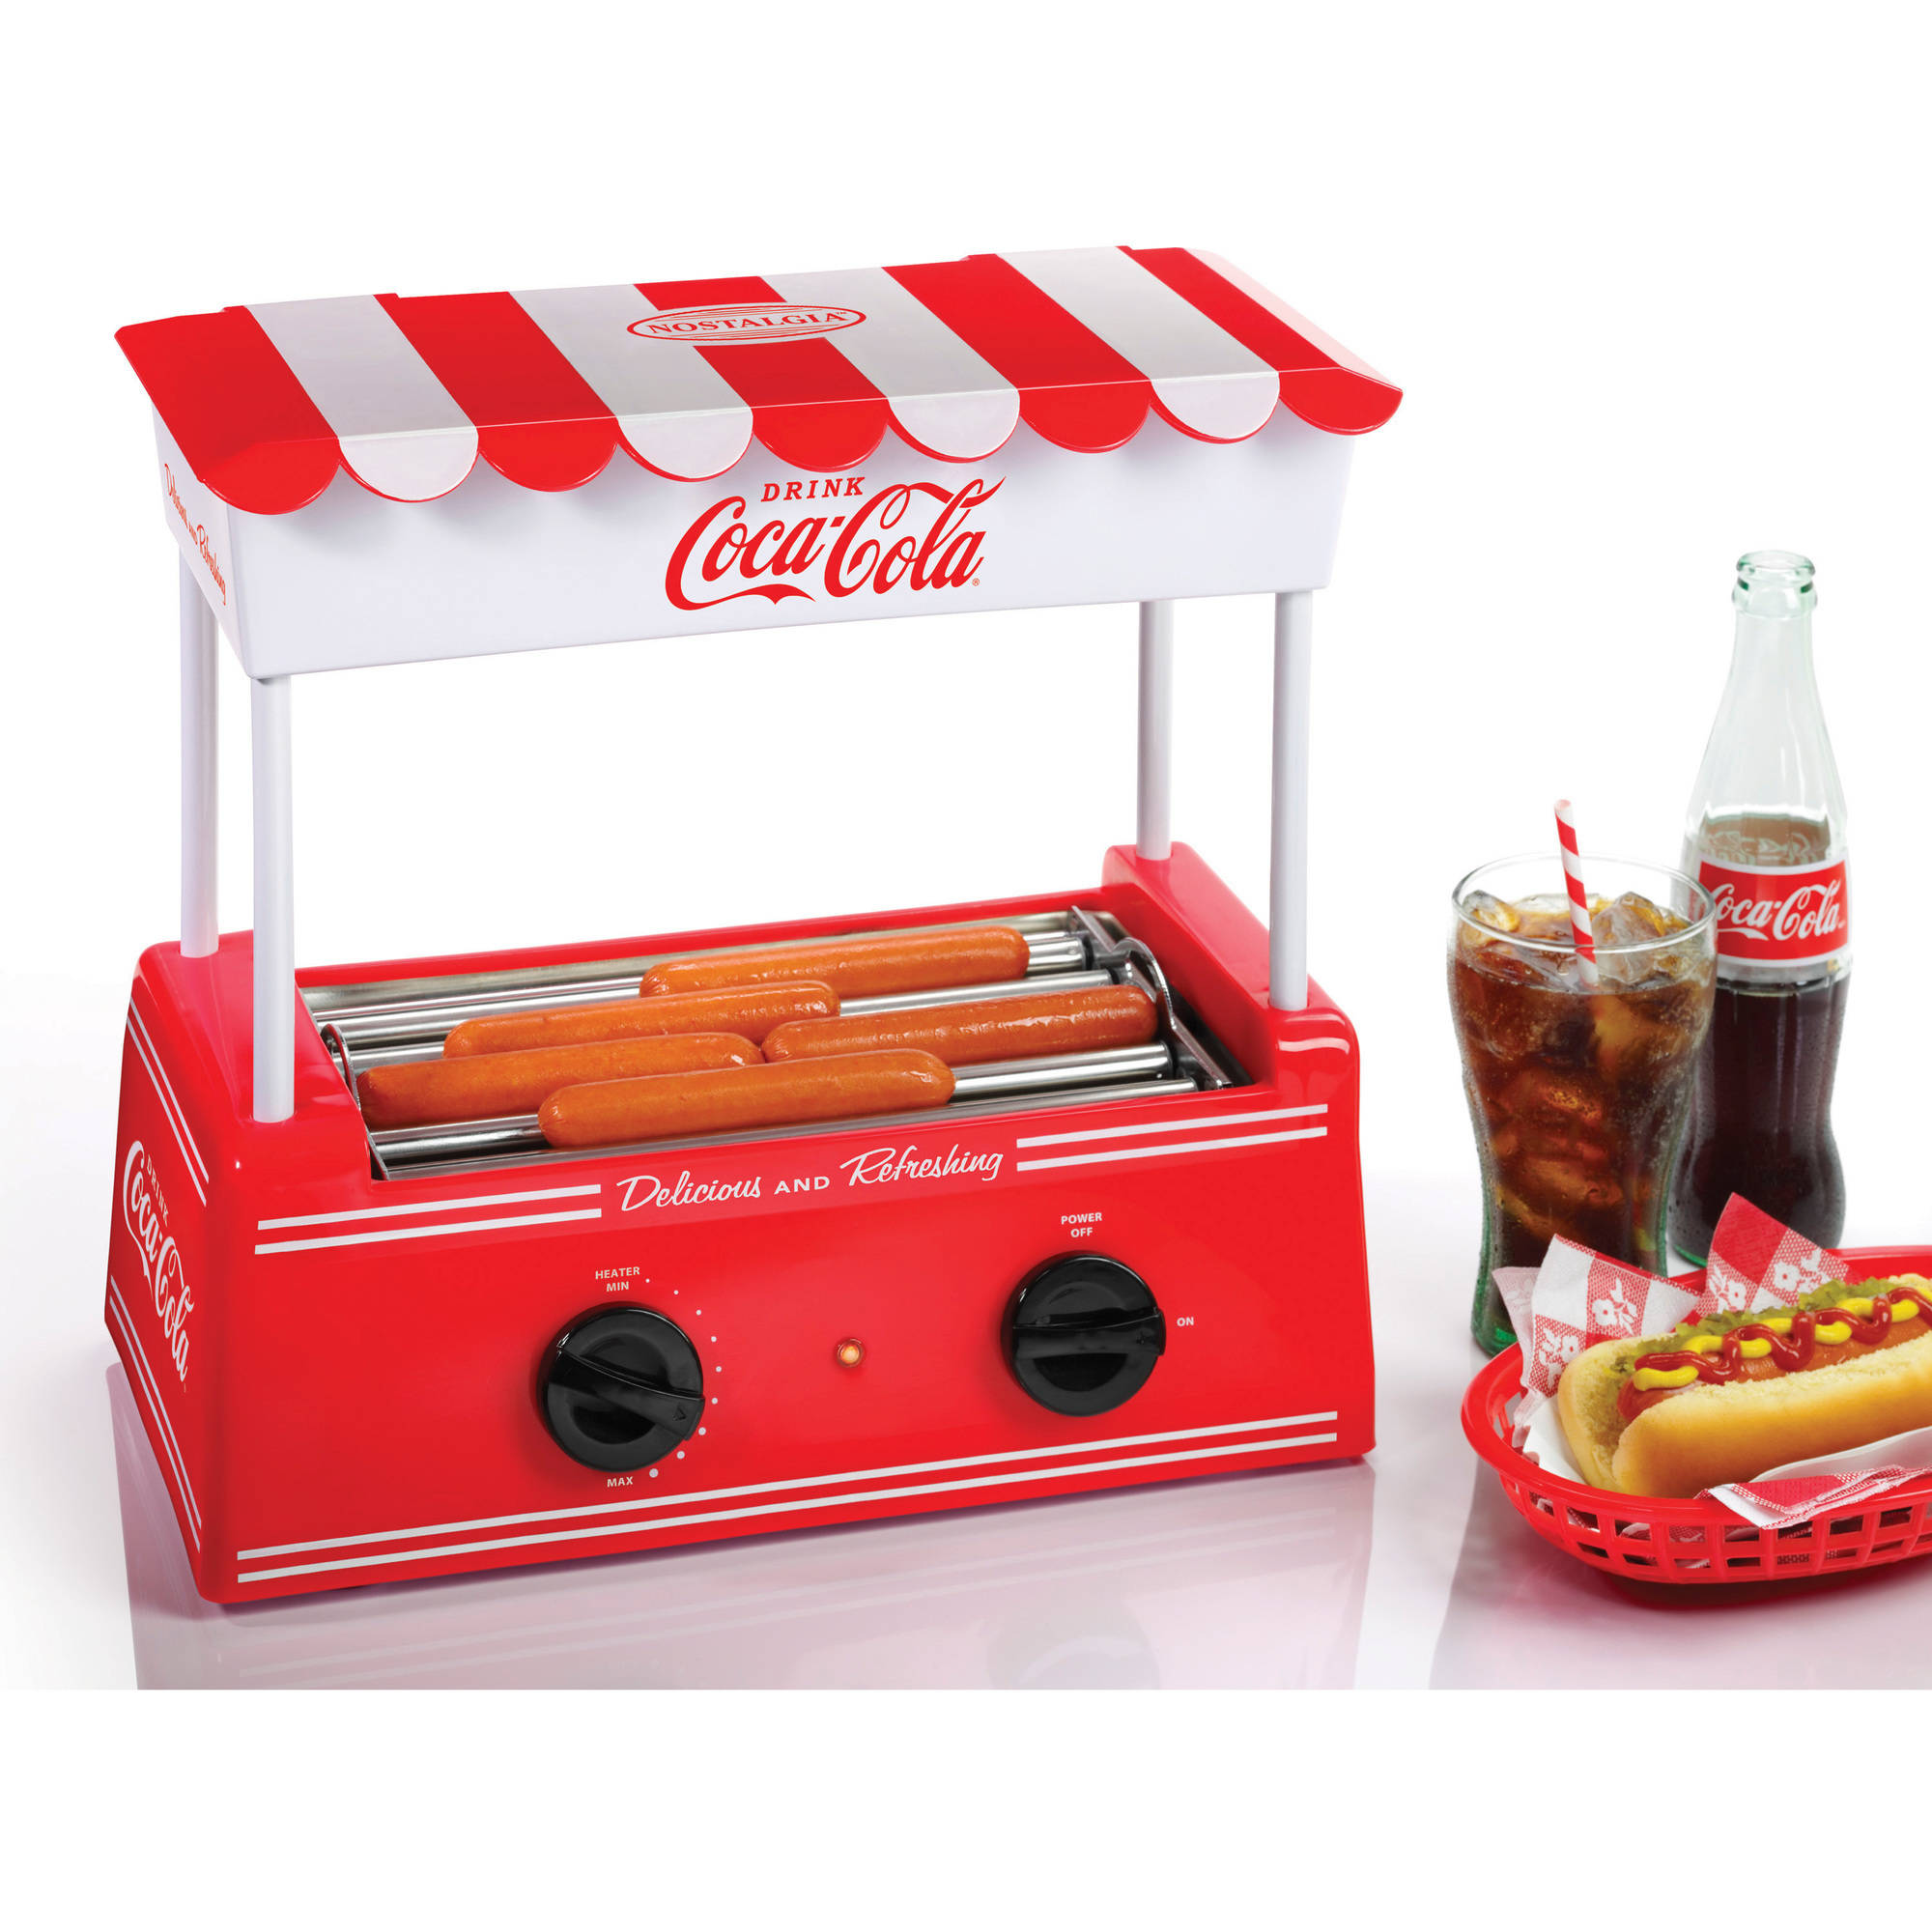 Nostalgia HDR565COKE Coca-Cola®Hot Dog Roller and Bun Warmer